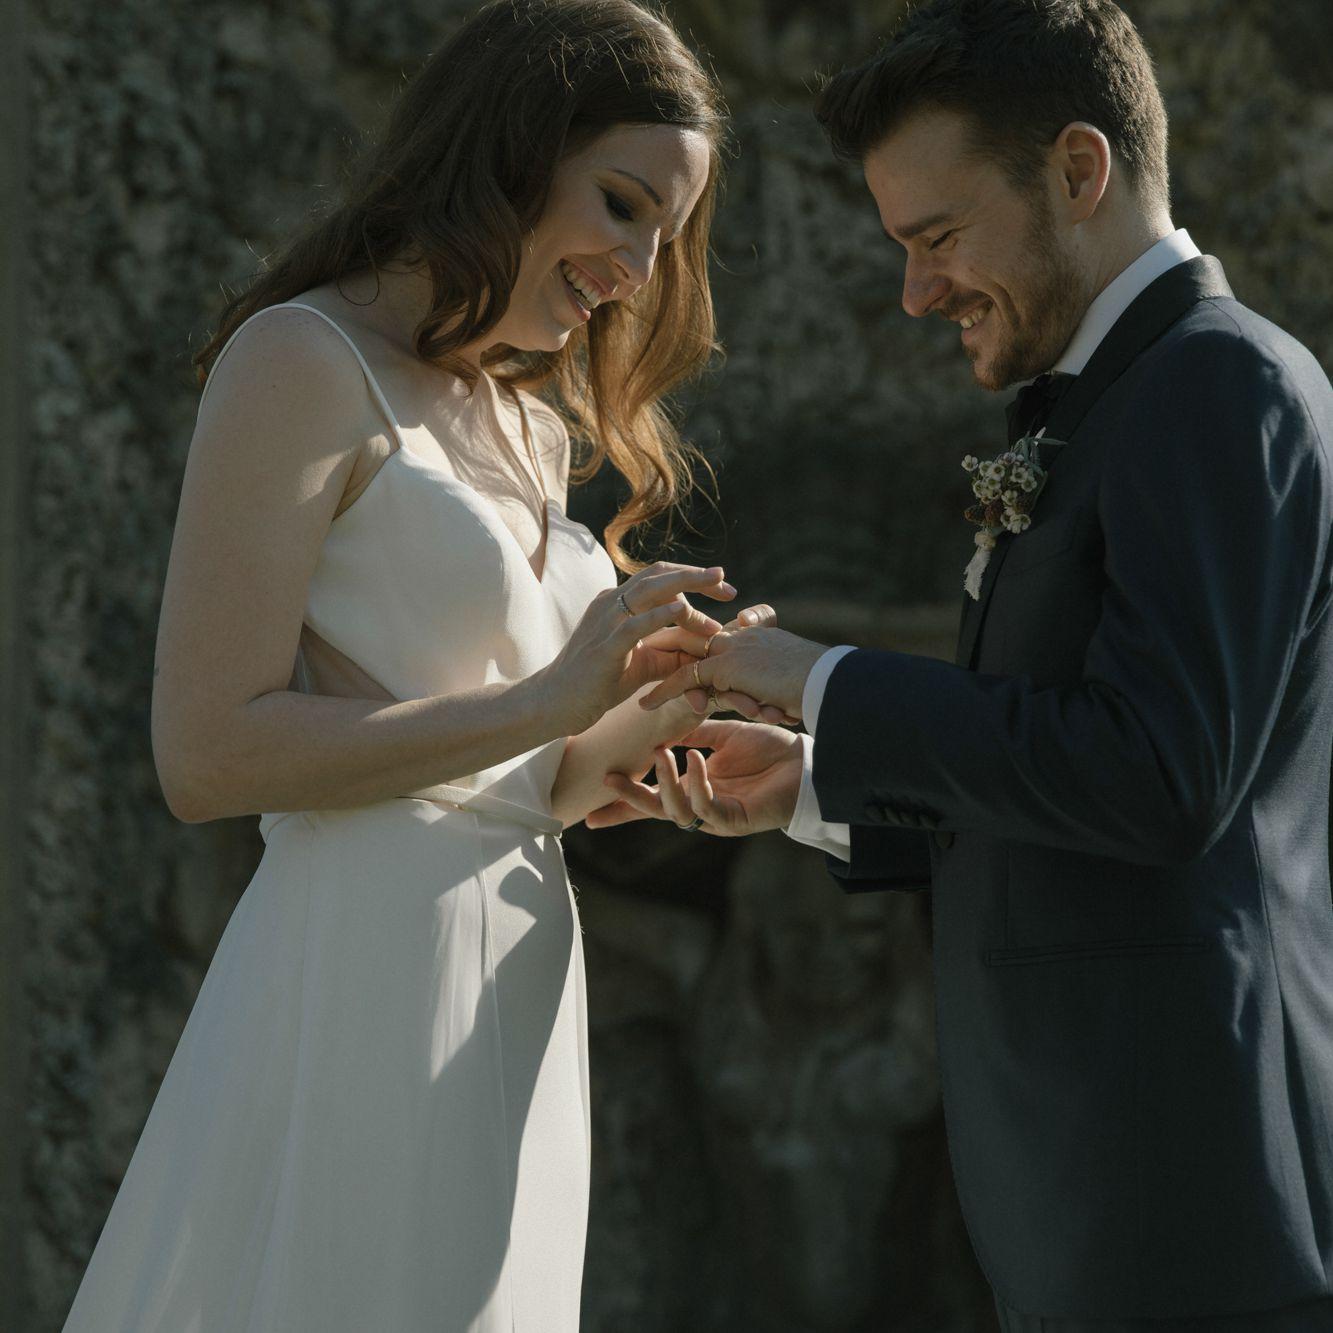 exchanging rings putting on wedding bands